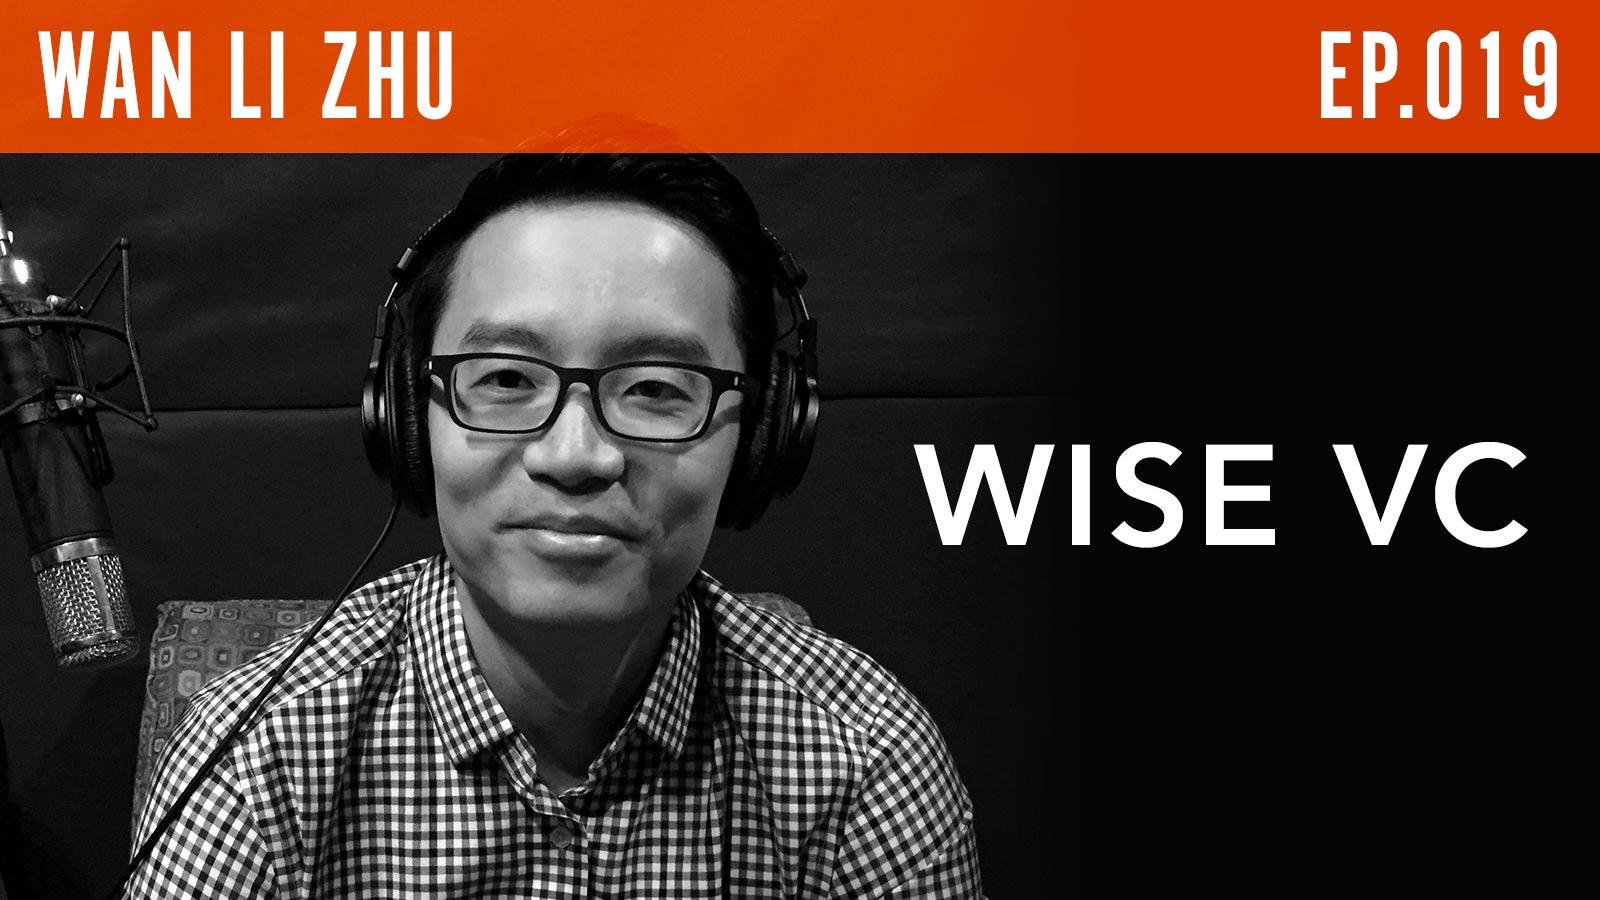 Wan Li Zhu  Wise VC